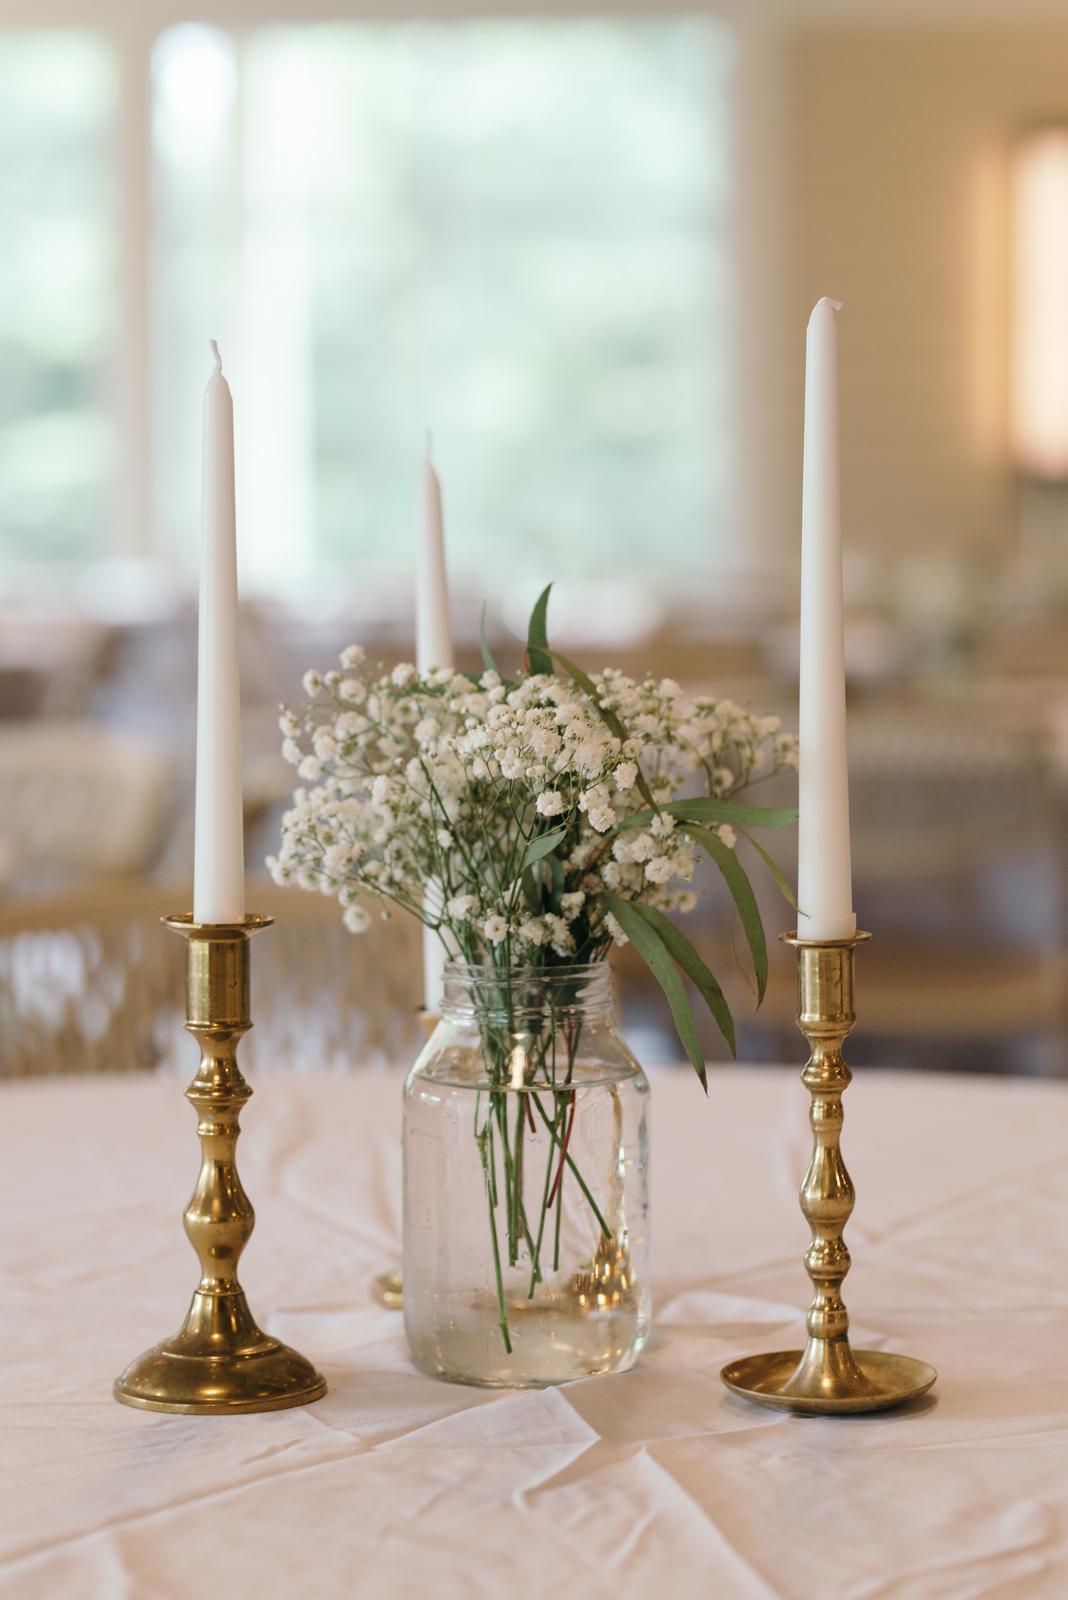 Ushers Ferry Historic Village Wedding Reception table decor